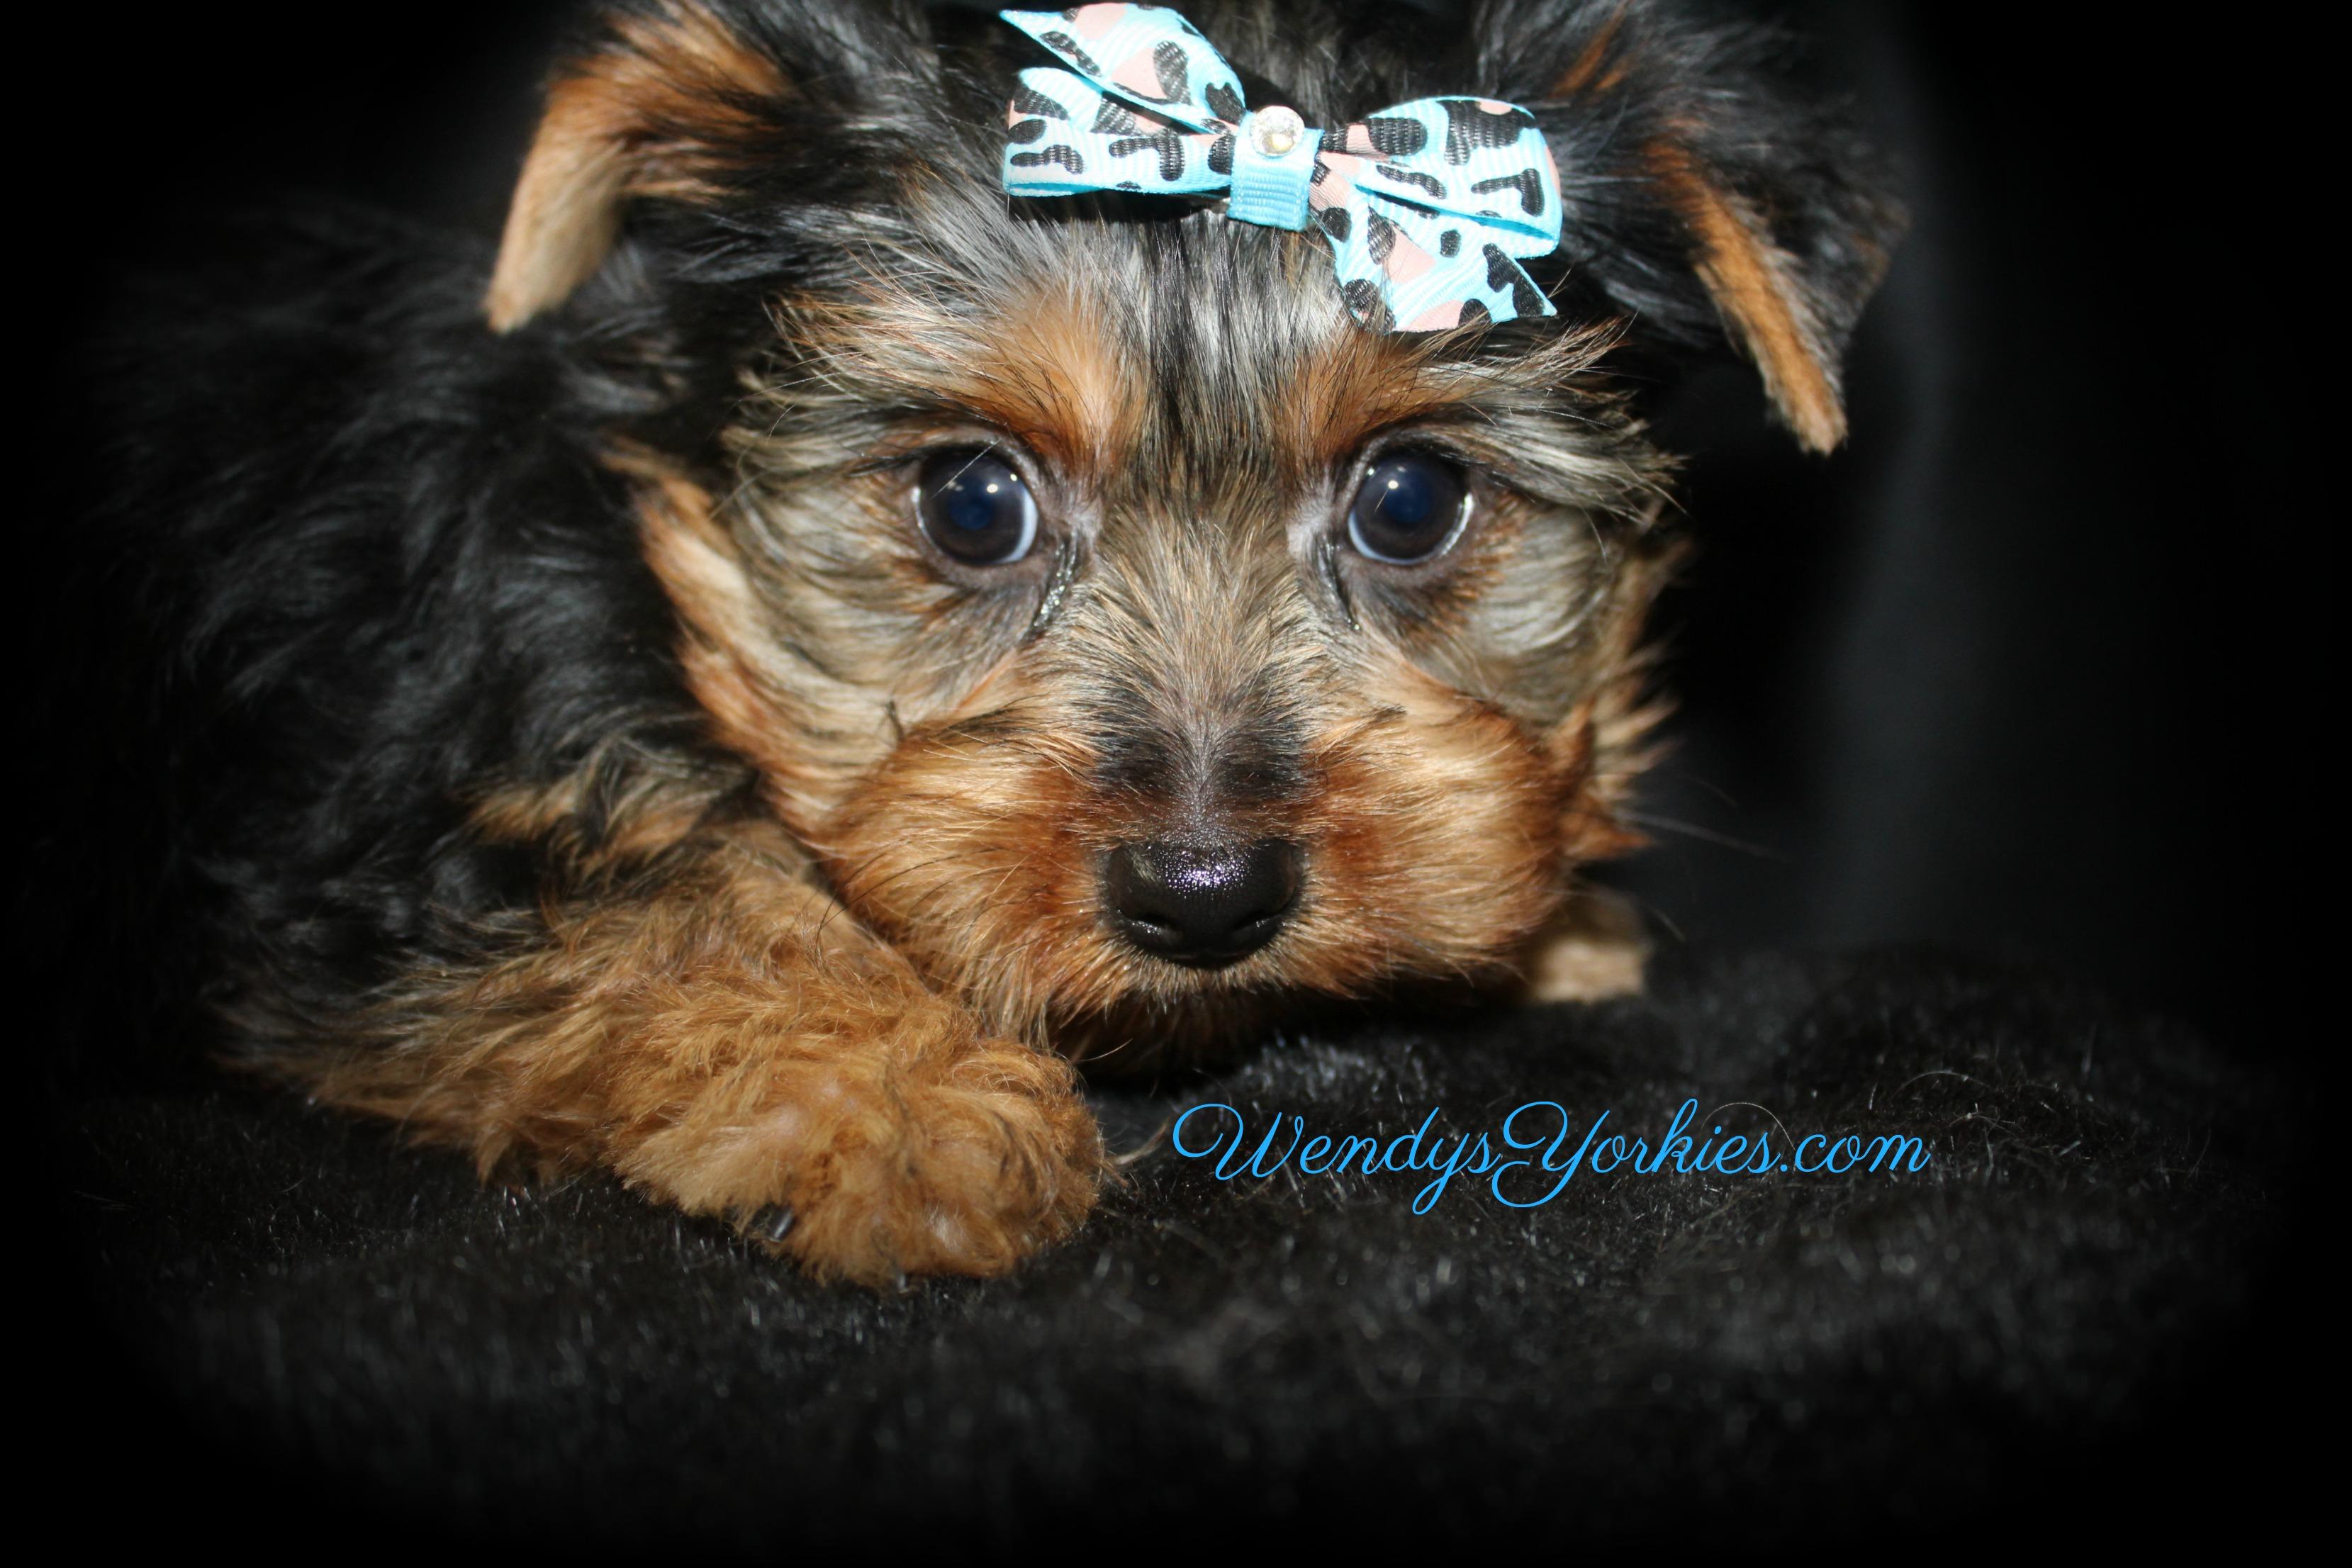 Yorkie puppy for sale, WendysYorkies.com m1